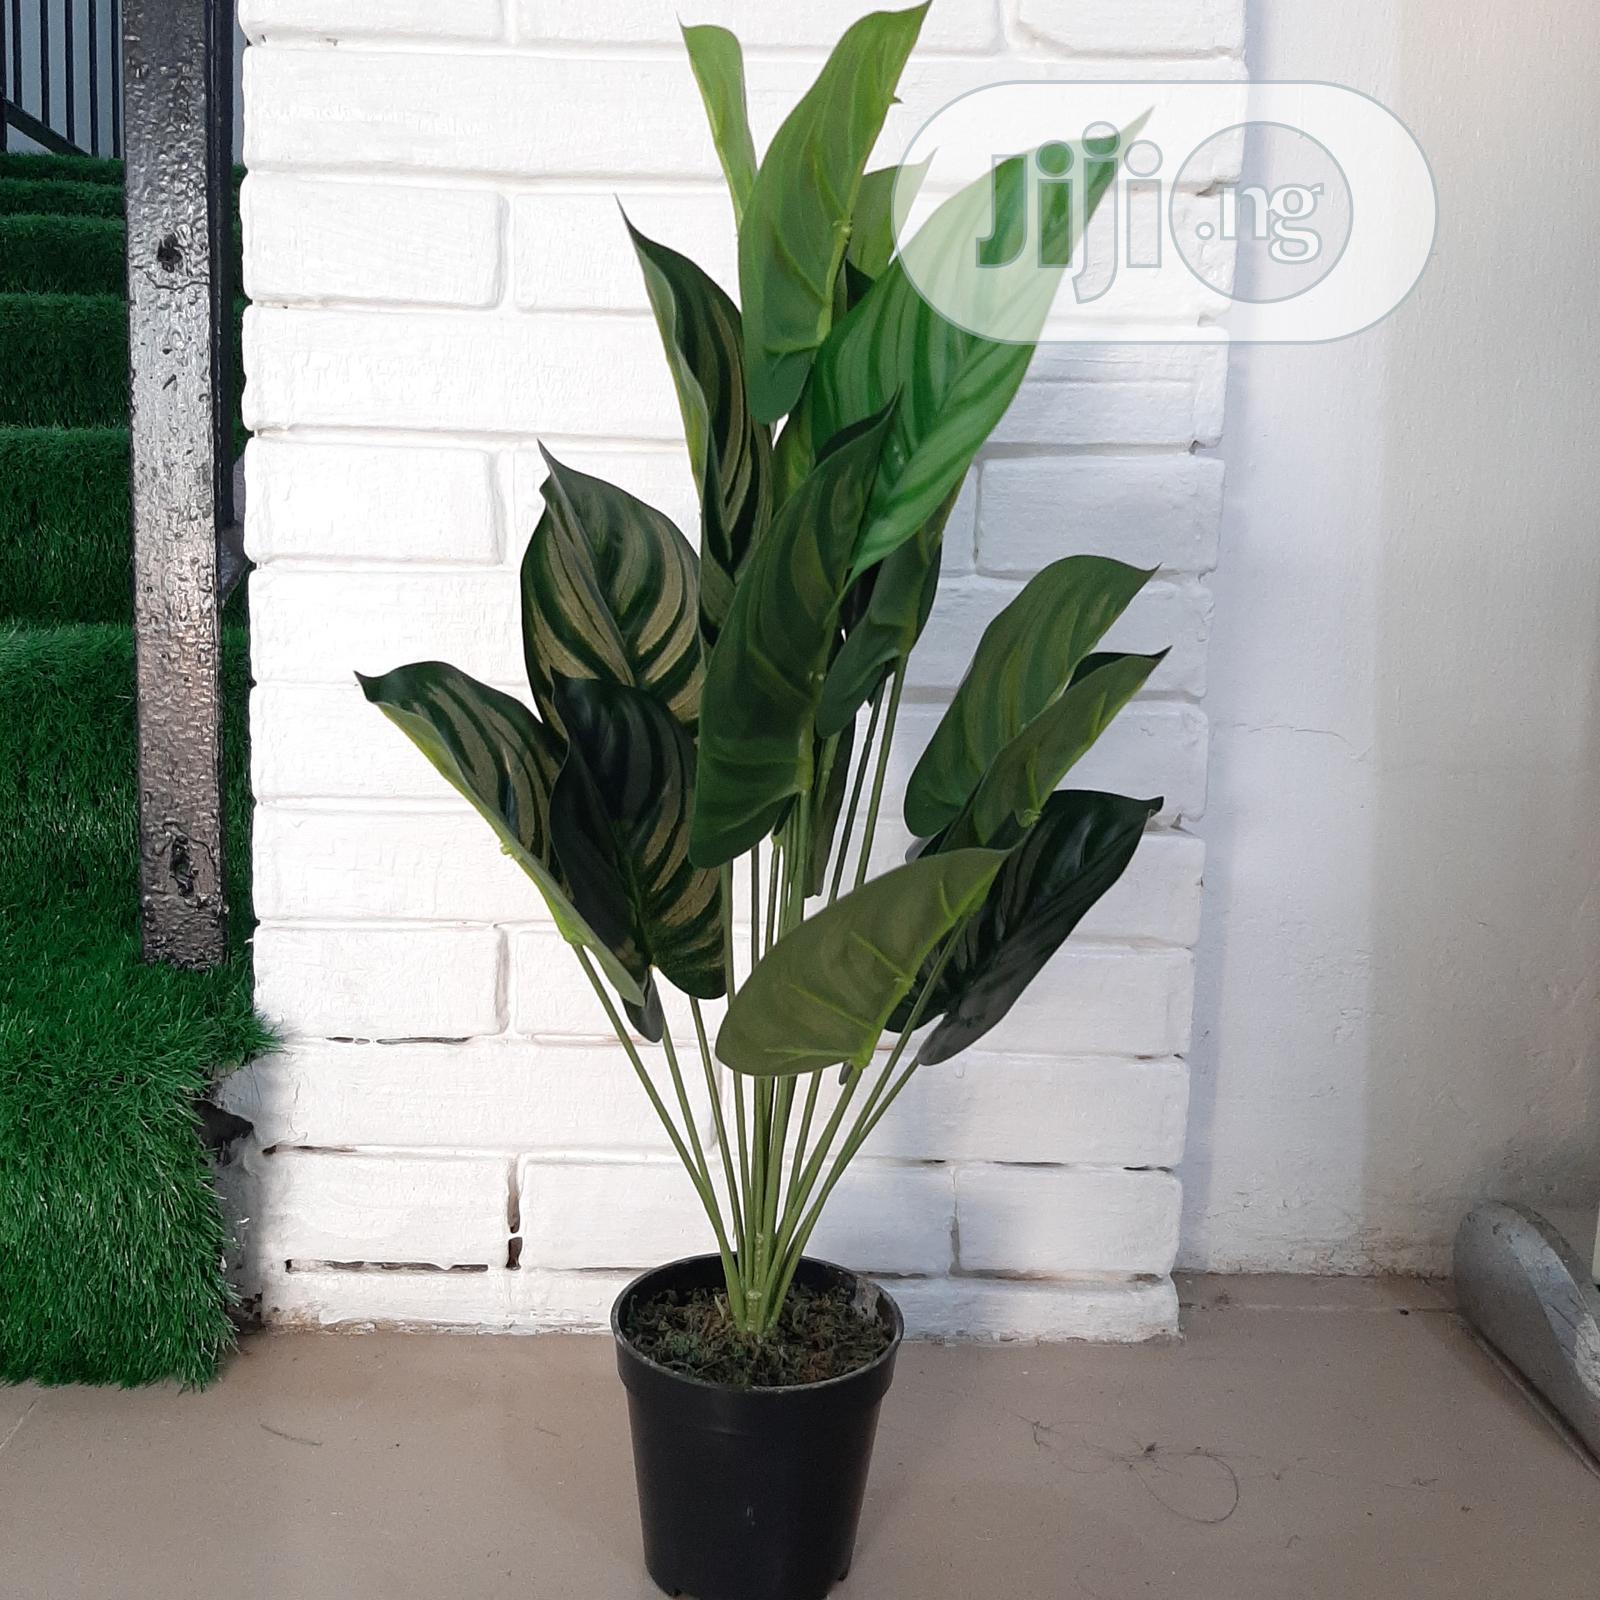 Artificial Monstera Plant From Bethelmendels for Huge Sale